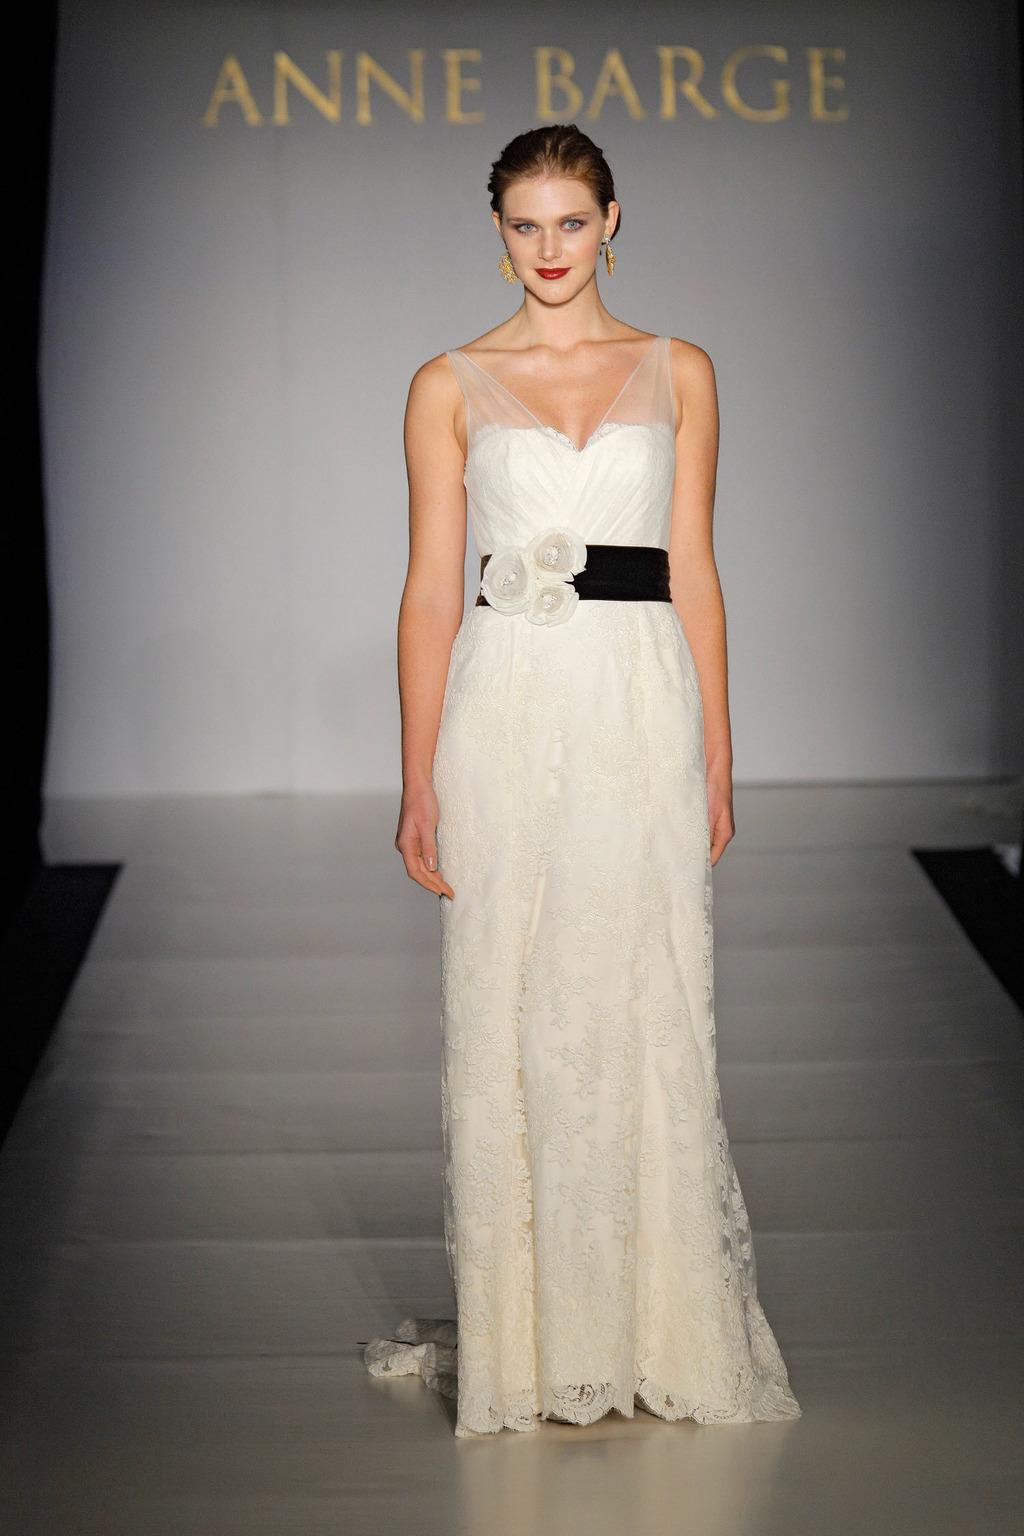 Fall-2011-wedding-dresses-anne-barge-grayson-v-neck-sheer-neckline-bridal-gown-black-sash-illusion-neckline.full